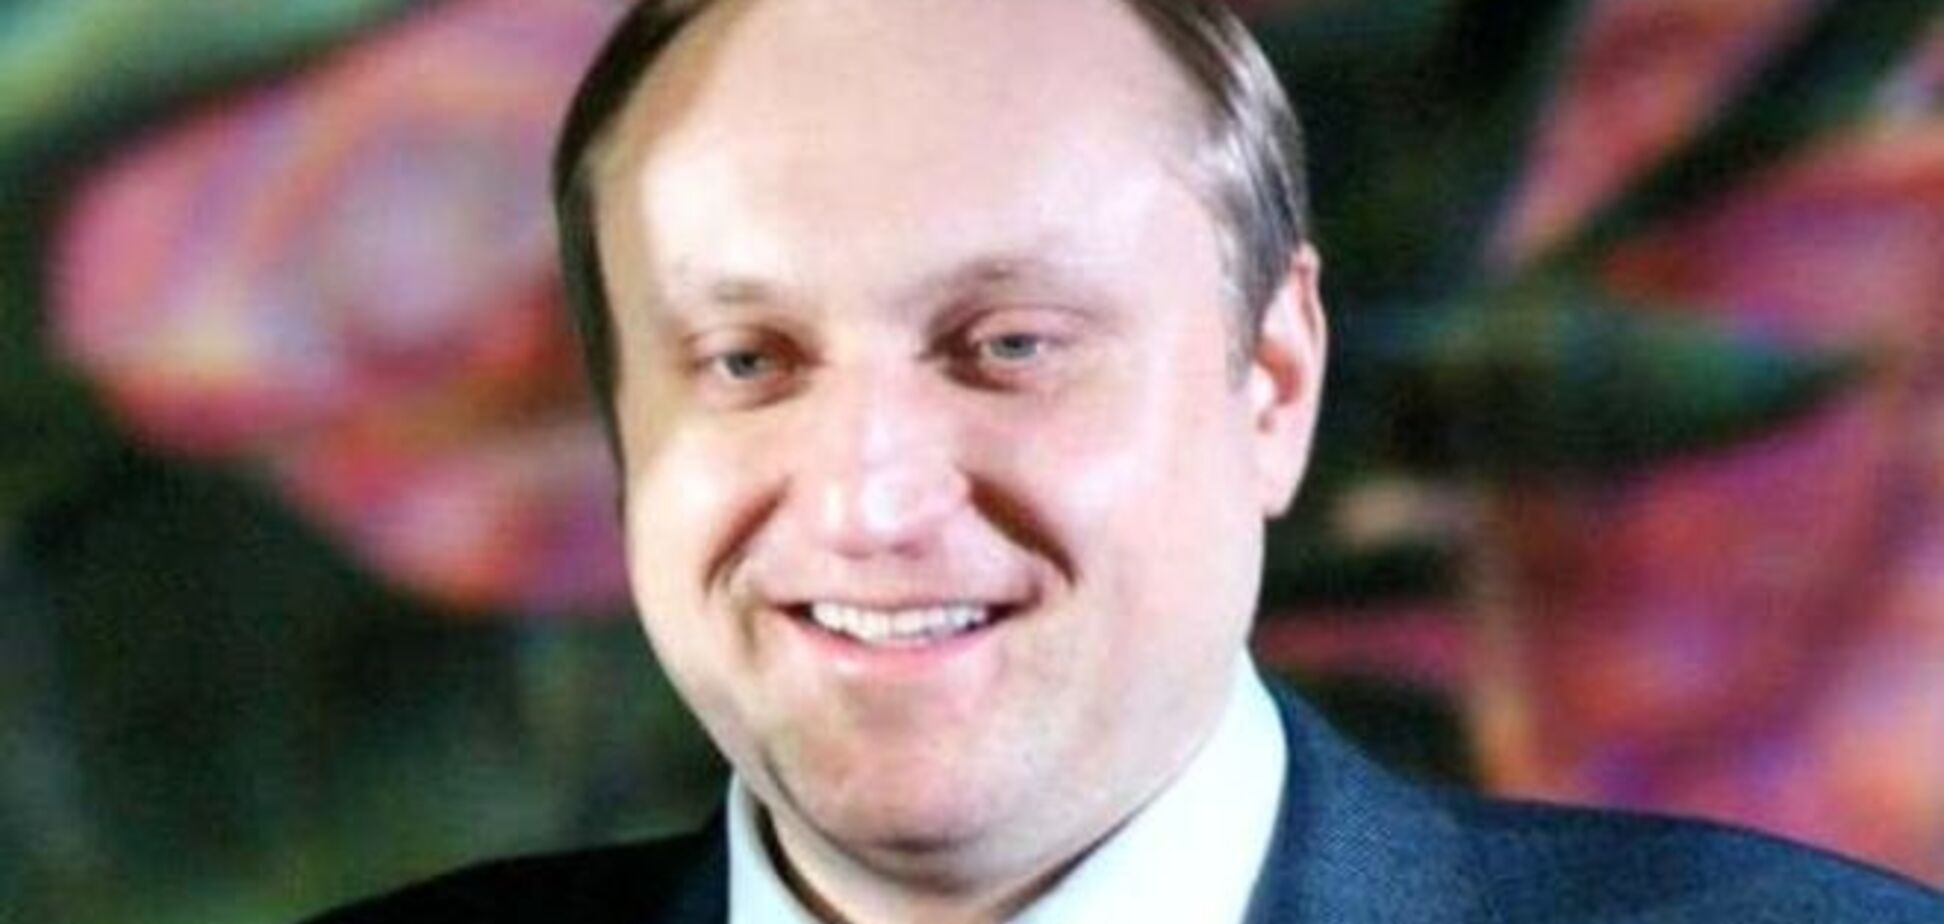 Сына экс-генпрокурора Пшонки объявили в розыск